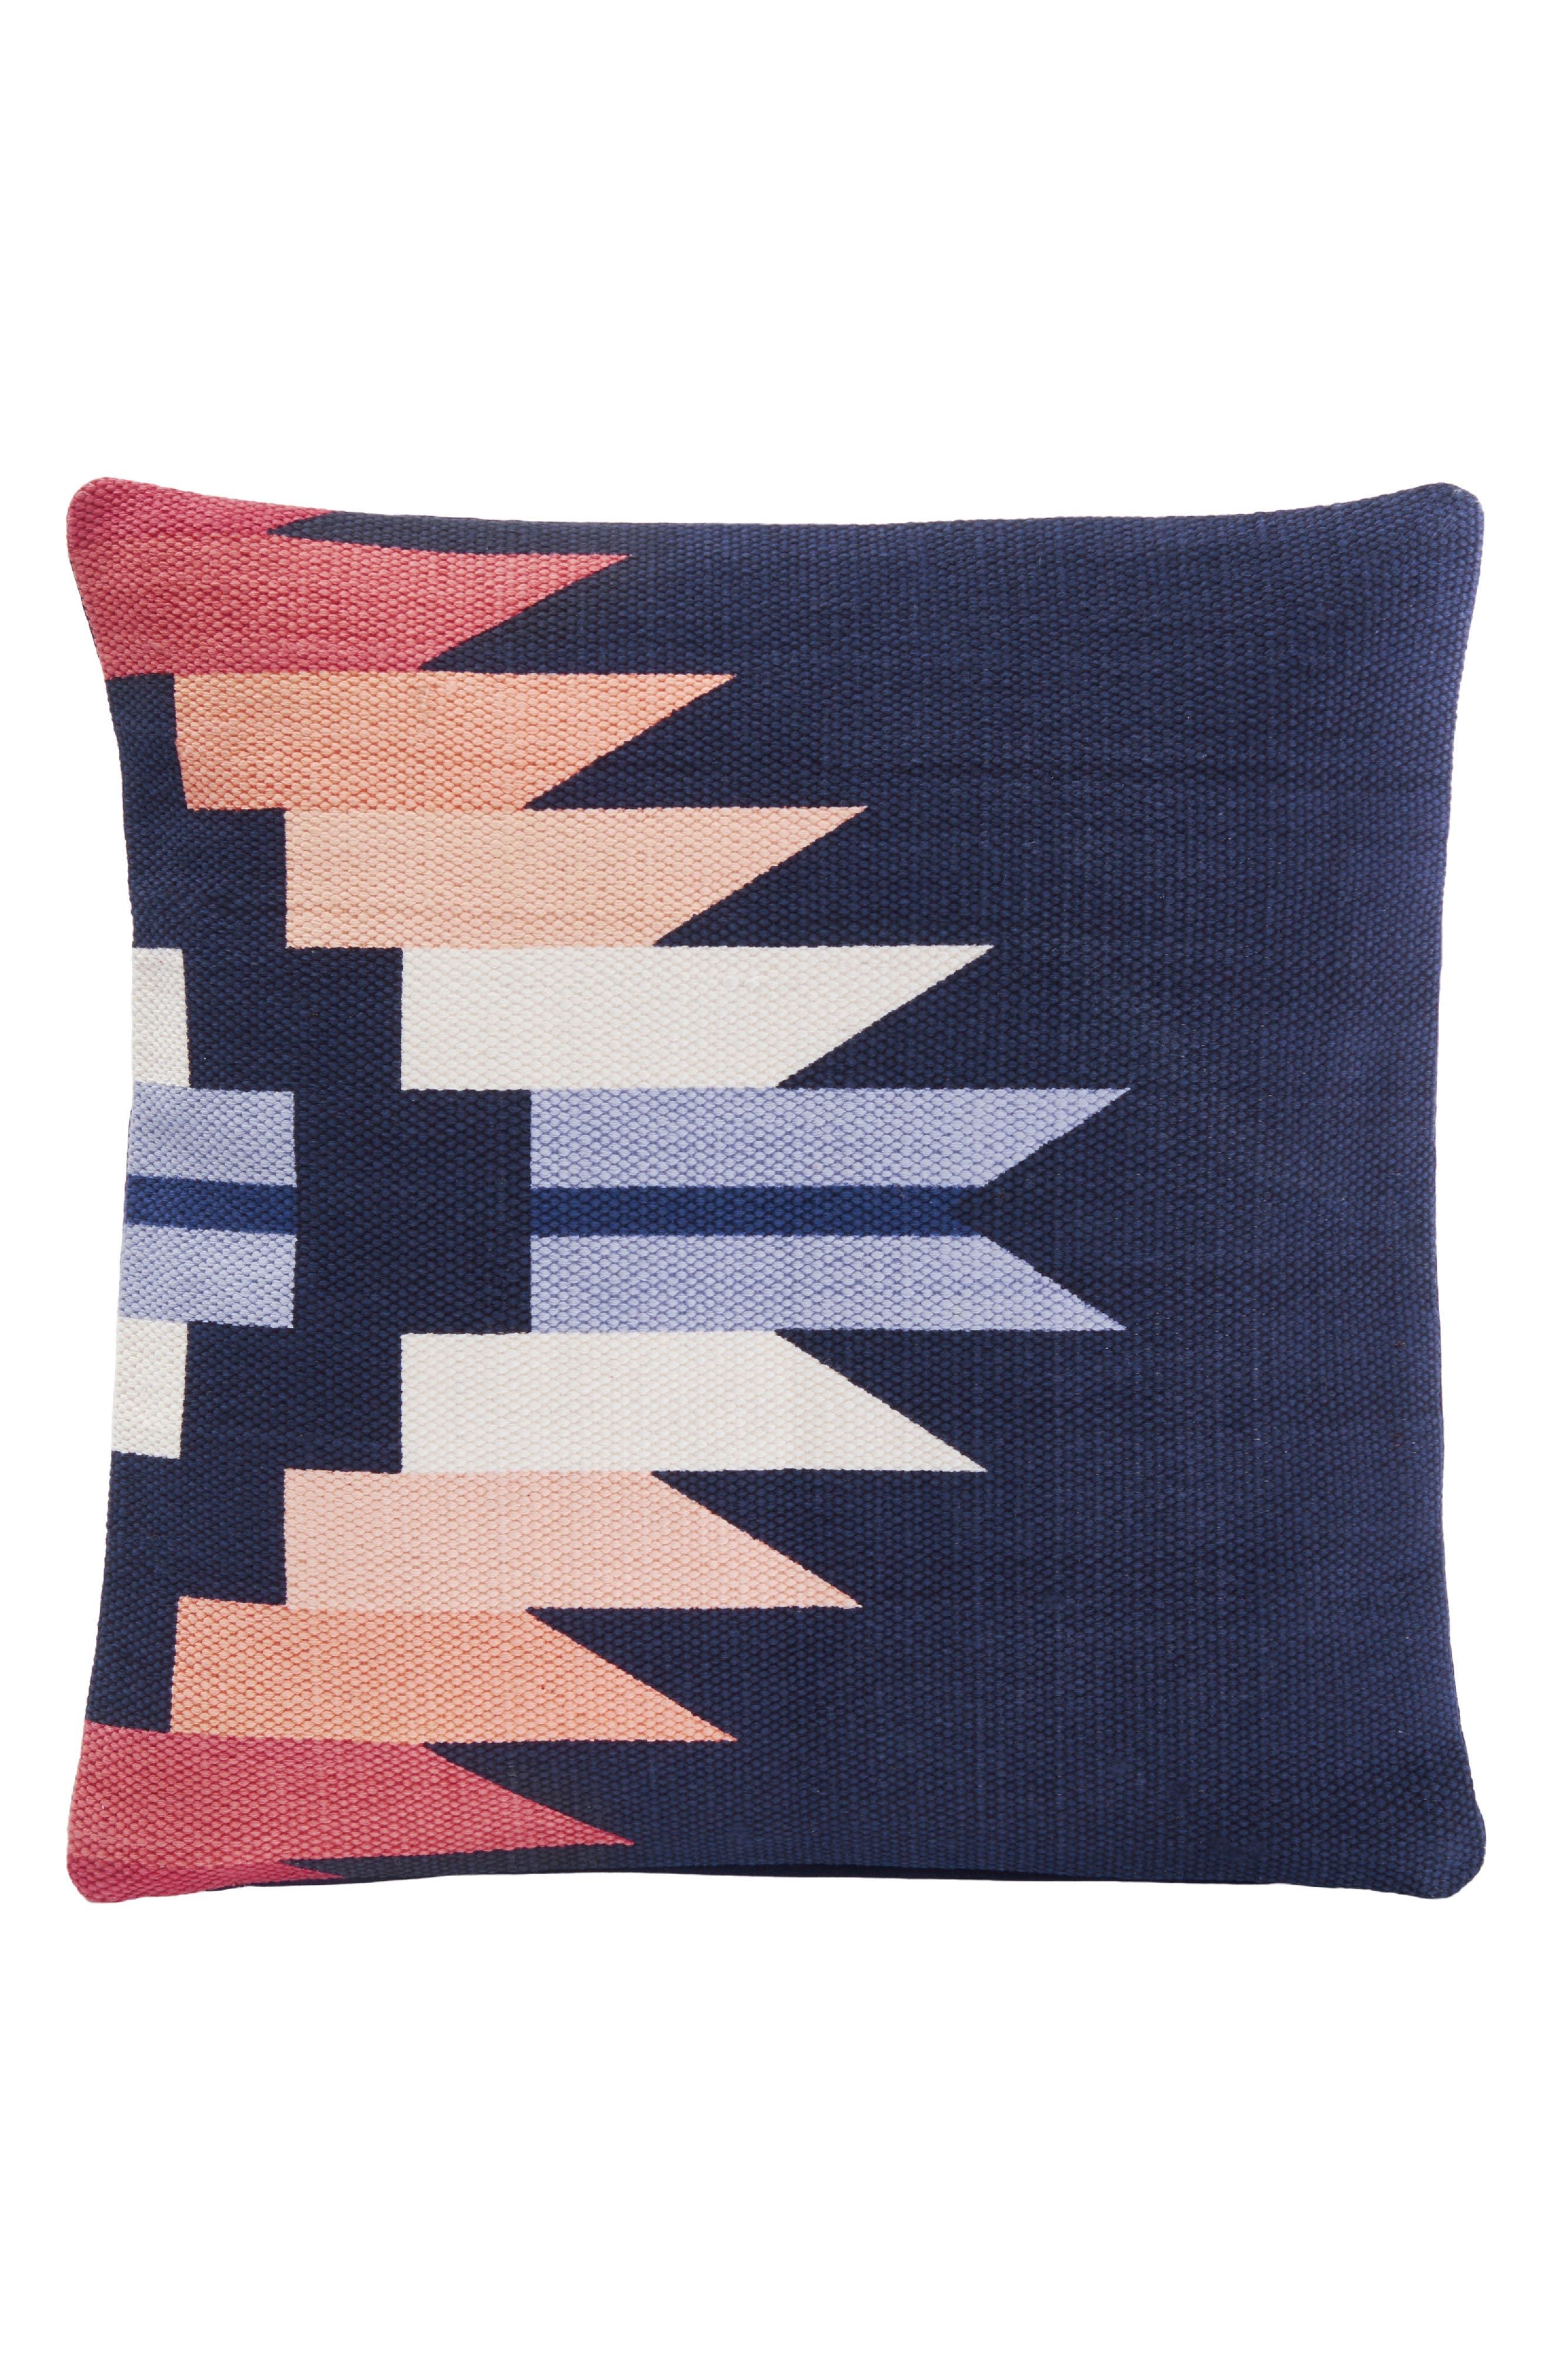 PENDLETON,                             Sequoia Sunset Accent Pillow,                             Main thumbnail 1, color,                             NAVY